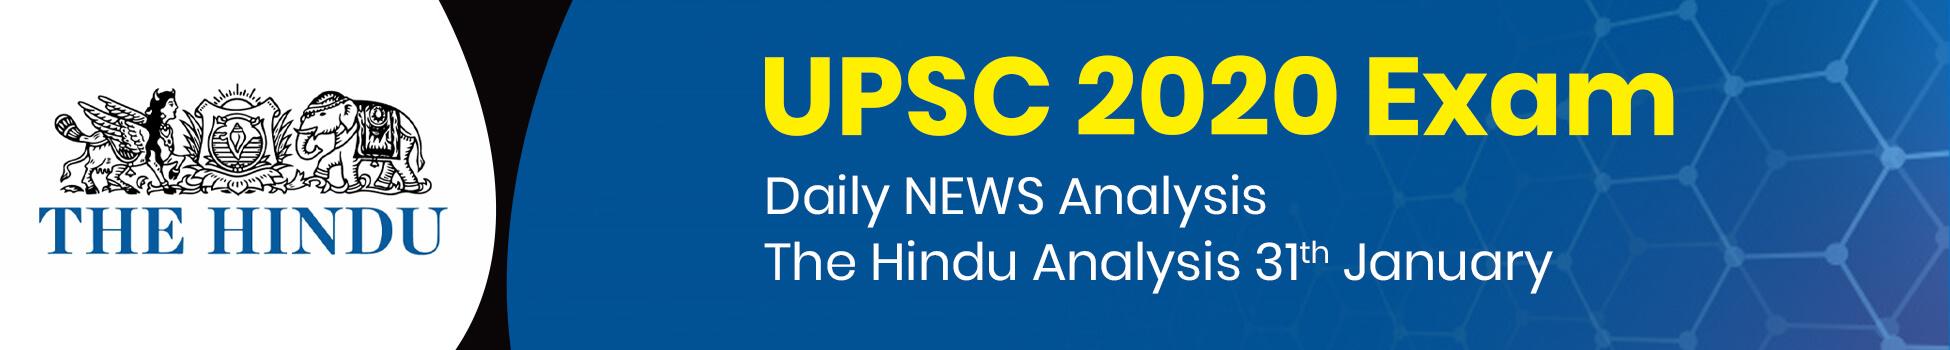 Daily NEWS Analysis   The Hindu Analysis 31st January   UPSC 2020